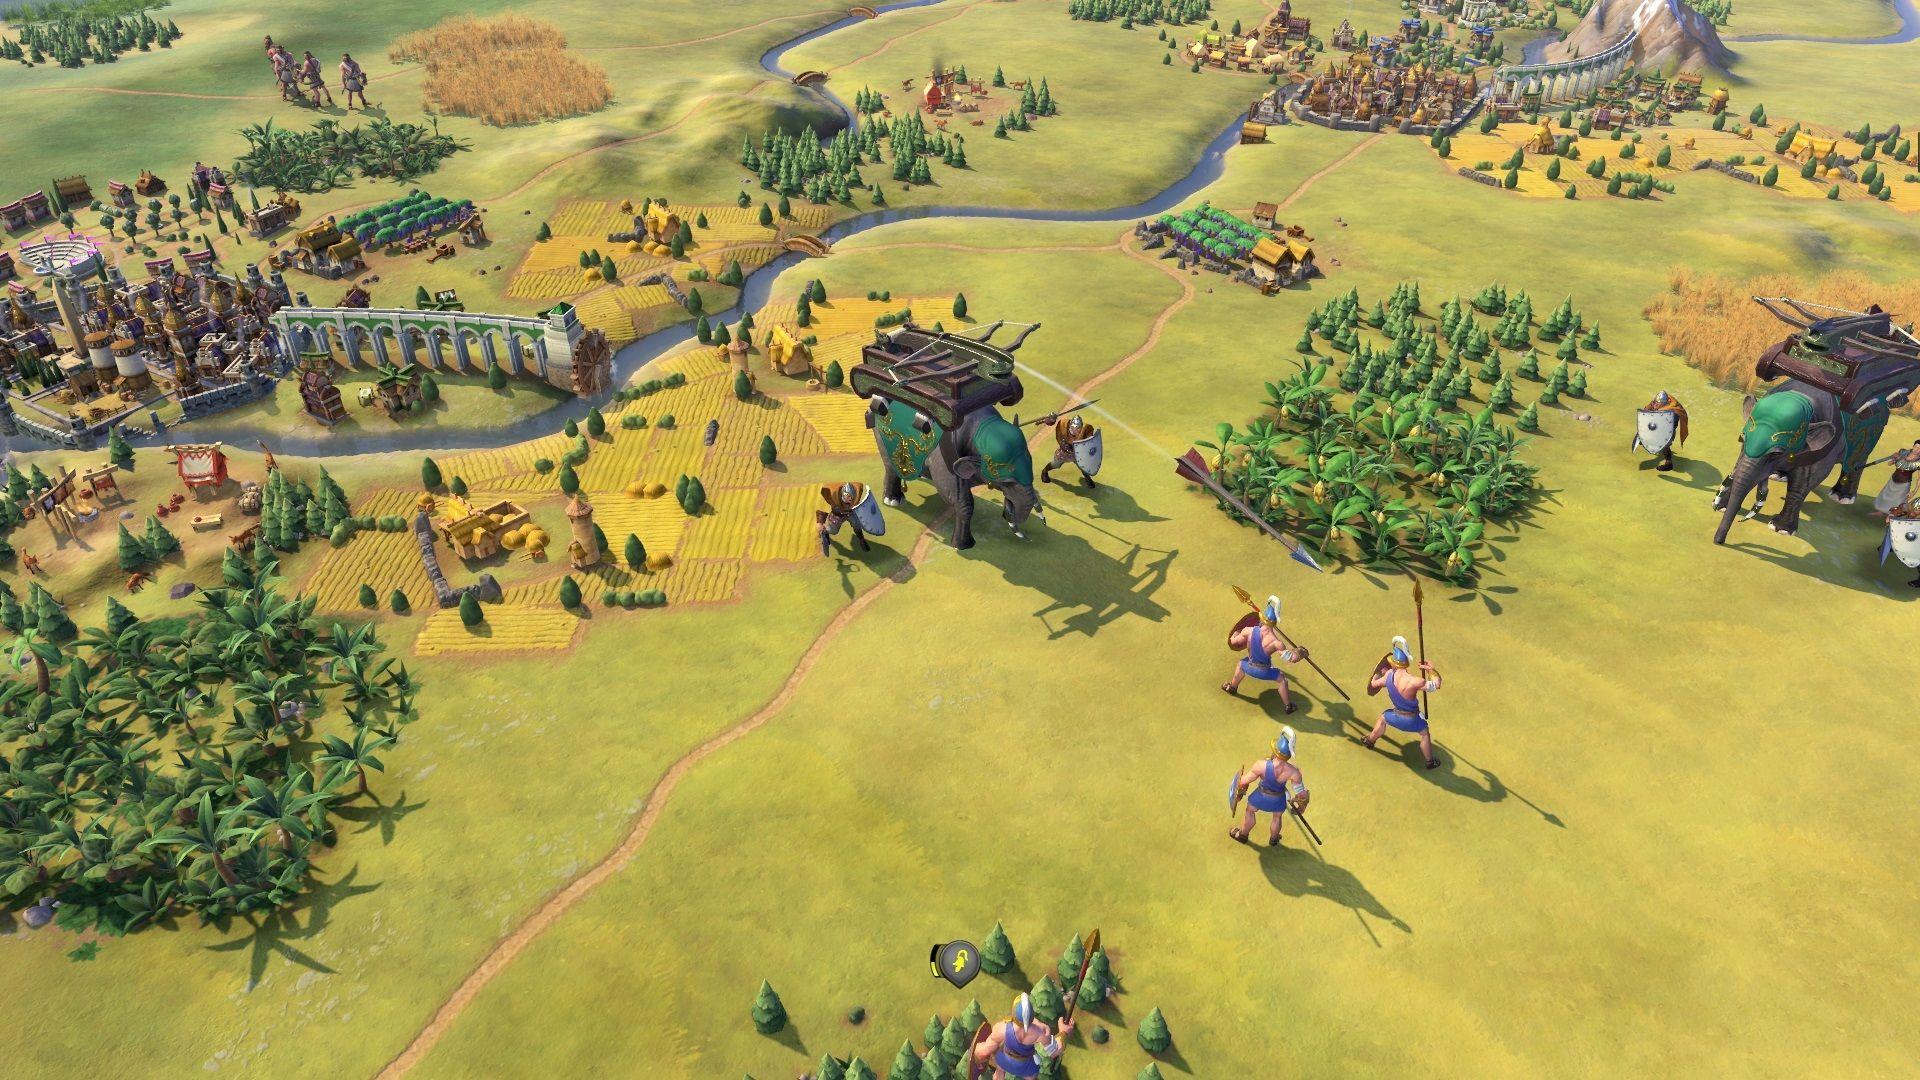 2KGMKT_CivilizationVI_Game-Image_DLC6_Domrey2_1.jpg